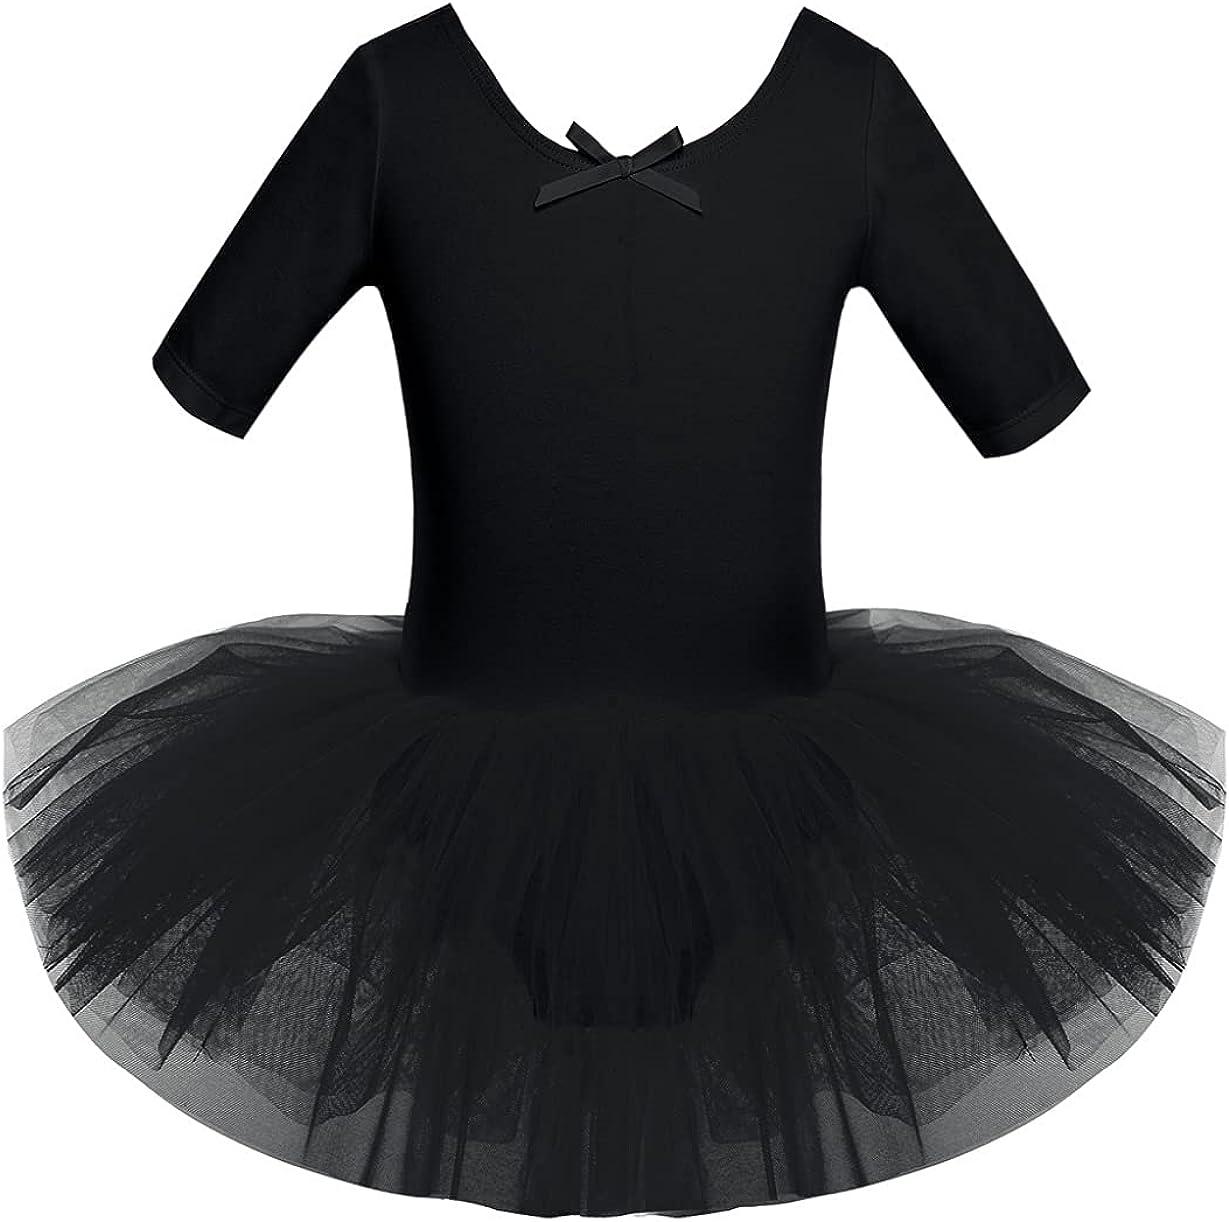 Freebily Girls Ruffle Flying Short Factory outlet Sleeve Dance for Ballet Tulsa Mall Dress